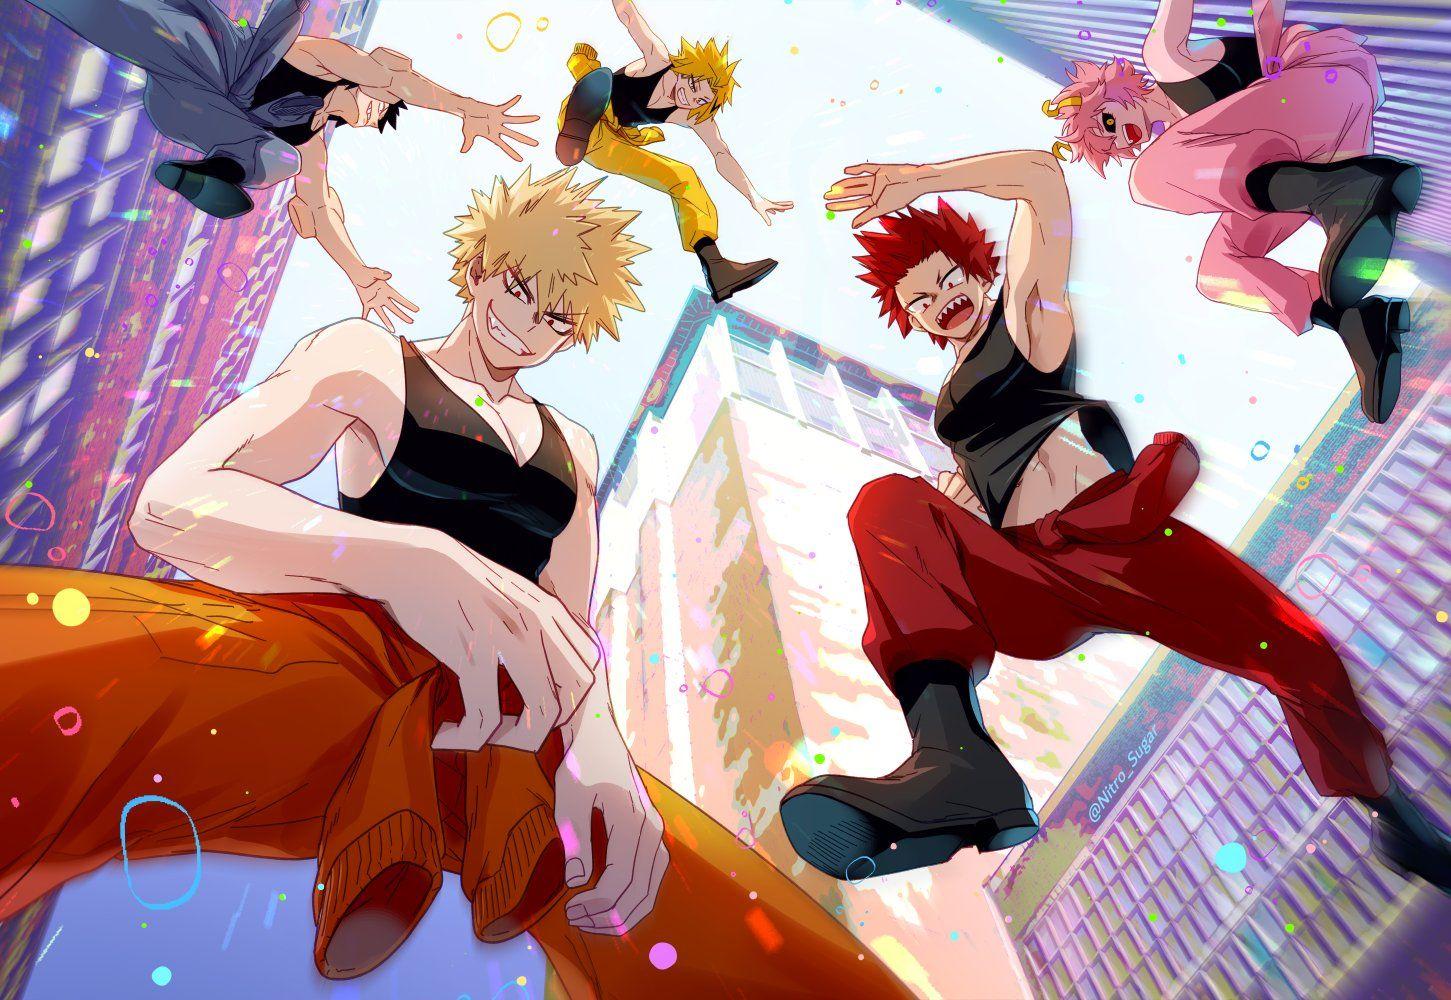 Seol렁tang On Twitter My Hero My Hero Academia Episodes My Hero Academia Manga